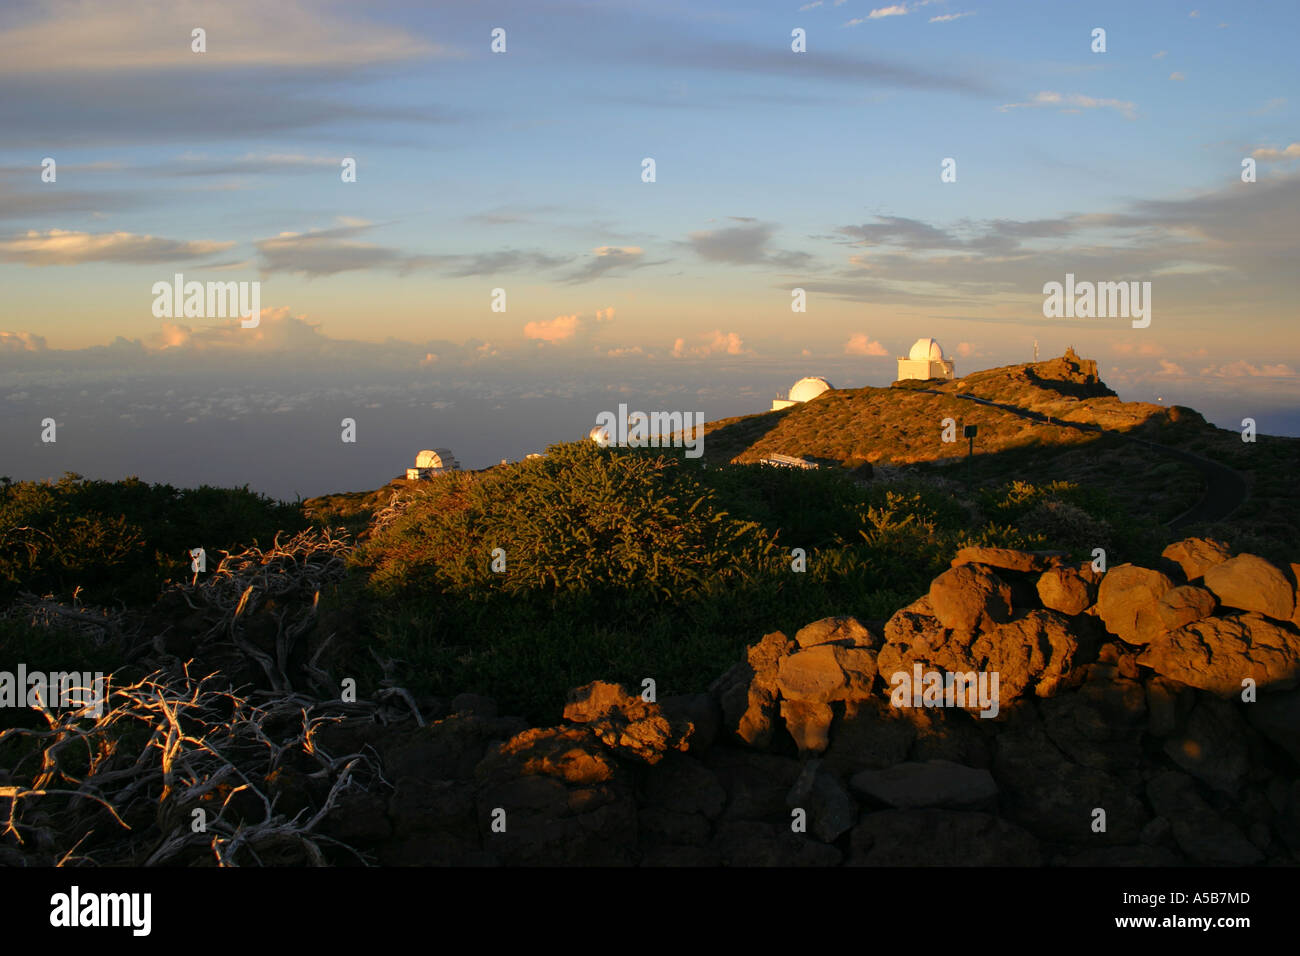 Skywatcher newton teleskop ota eur picclick de